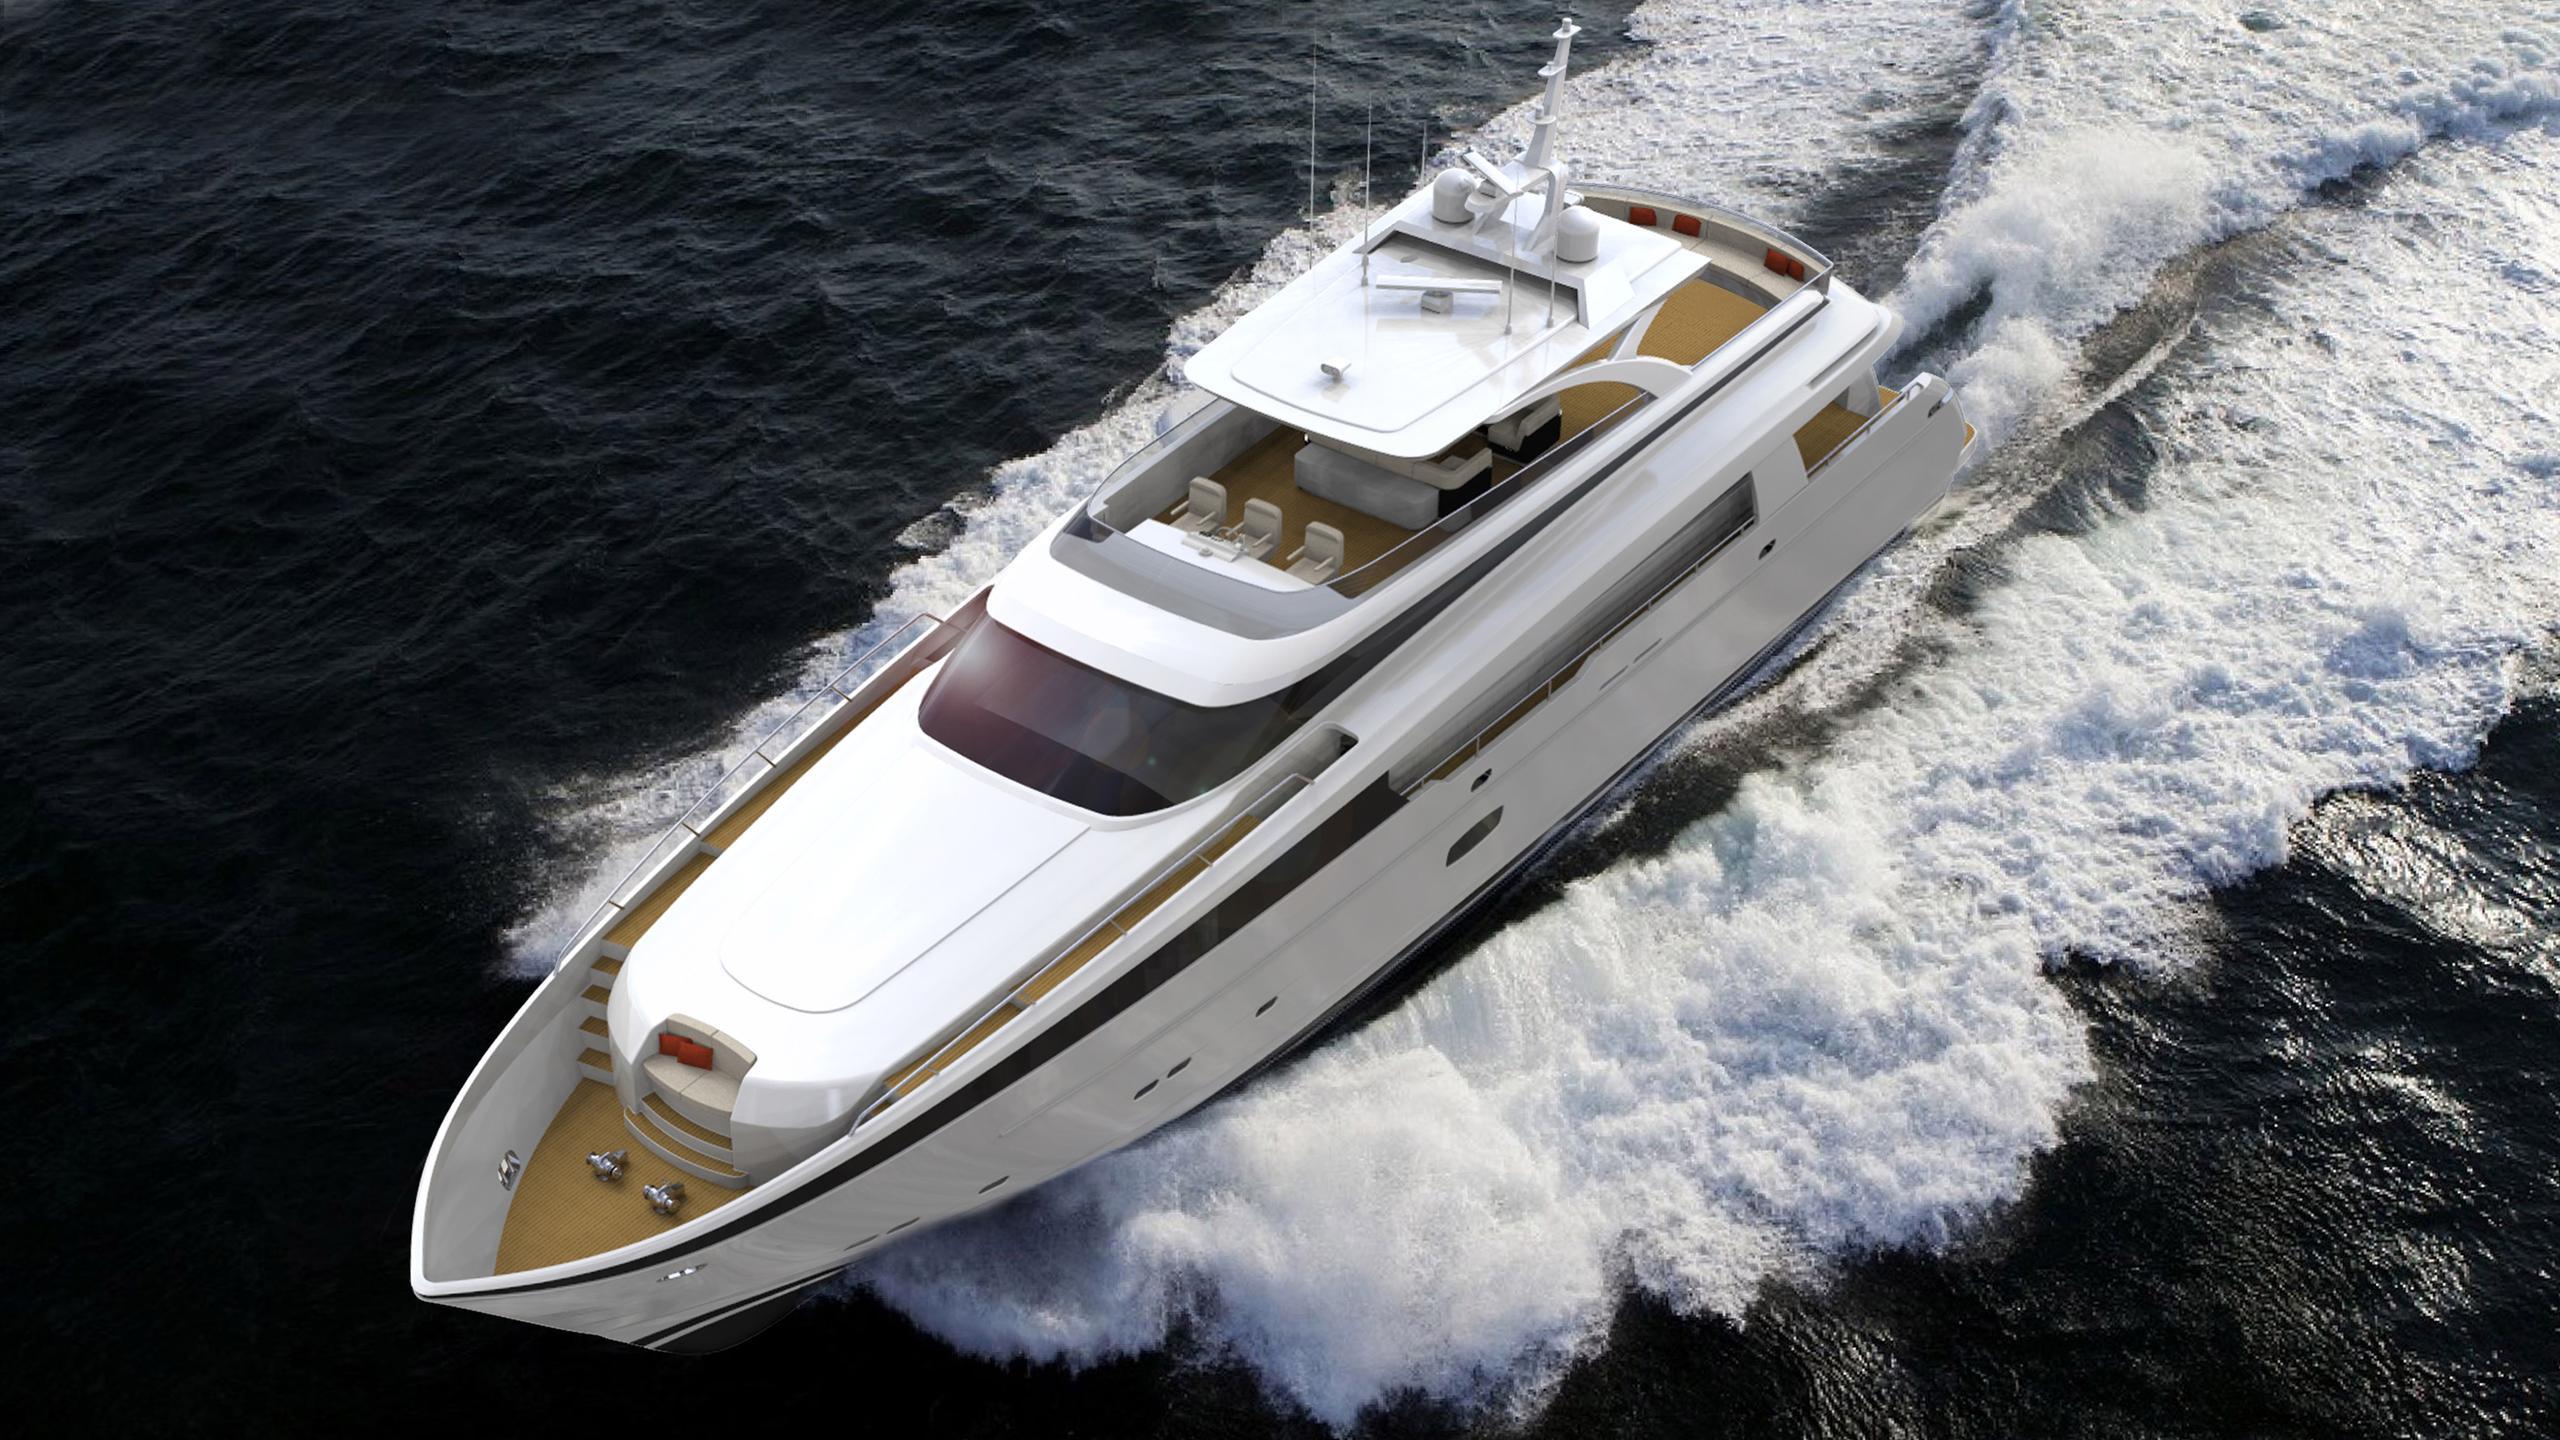 abaco motoryacht horizon rp110 2017 33m rendering